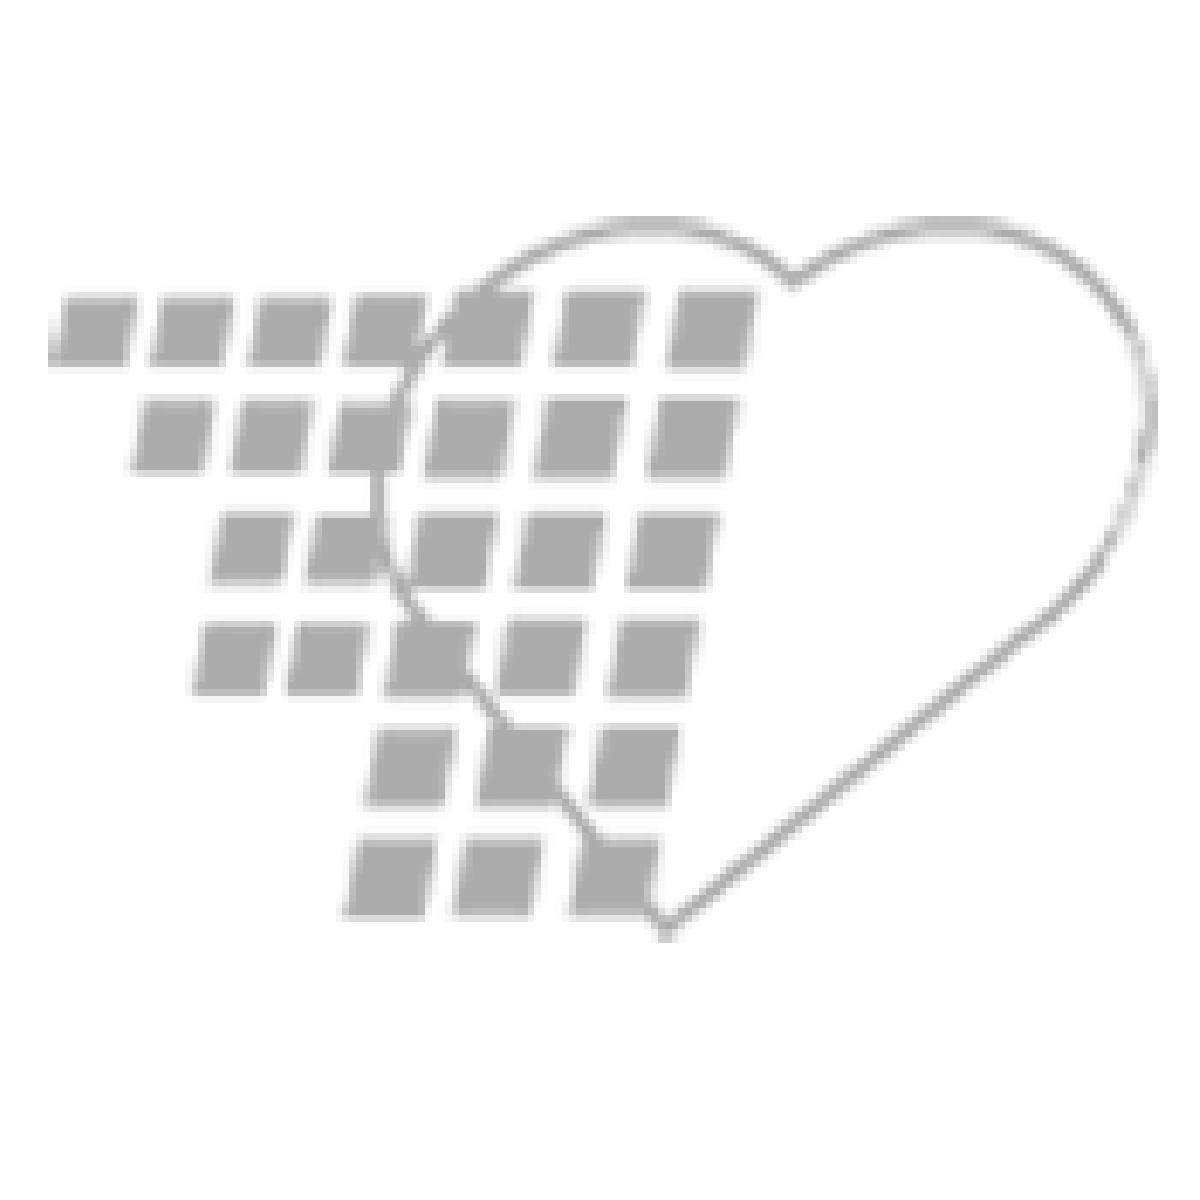 06-93-6942 Demo Dose® LORazepm (Ativn) 1 mL (2 mg/mL)